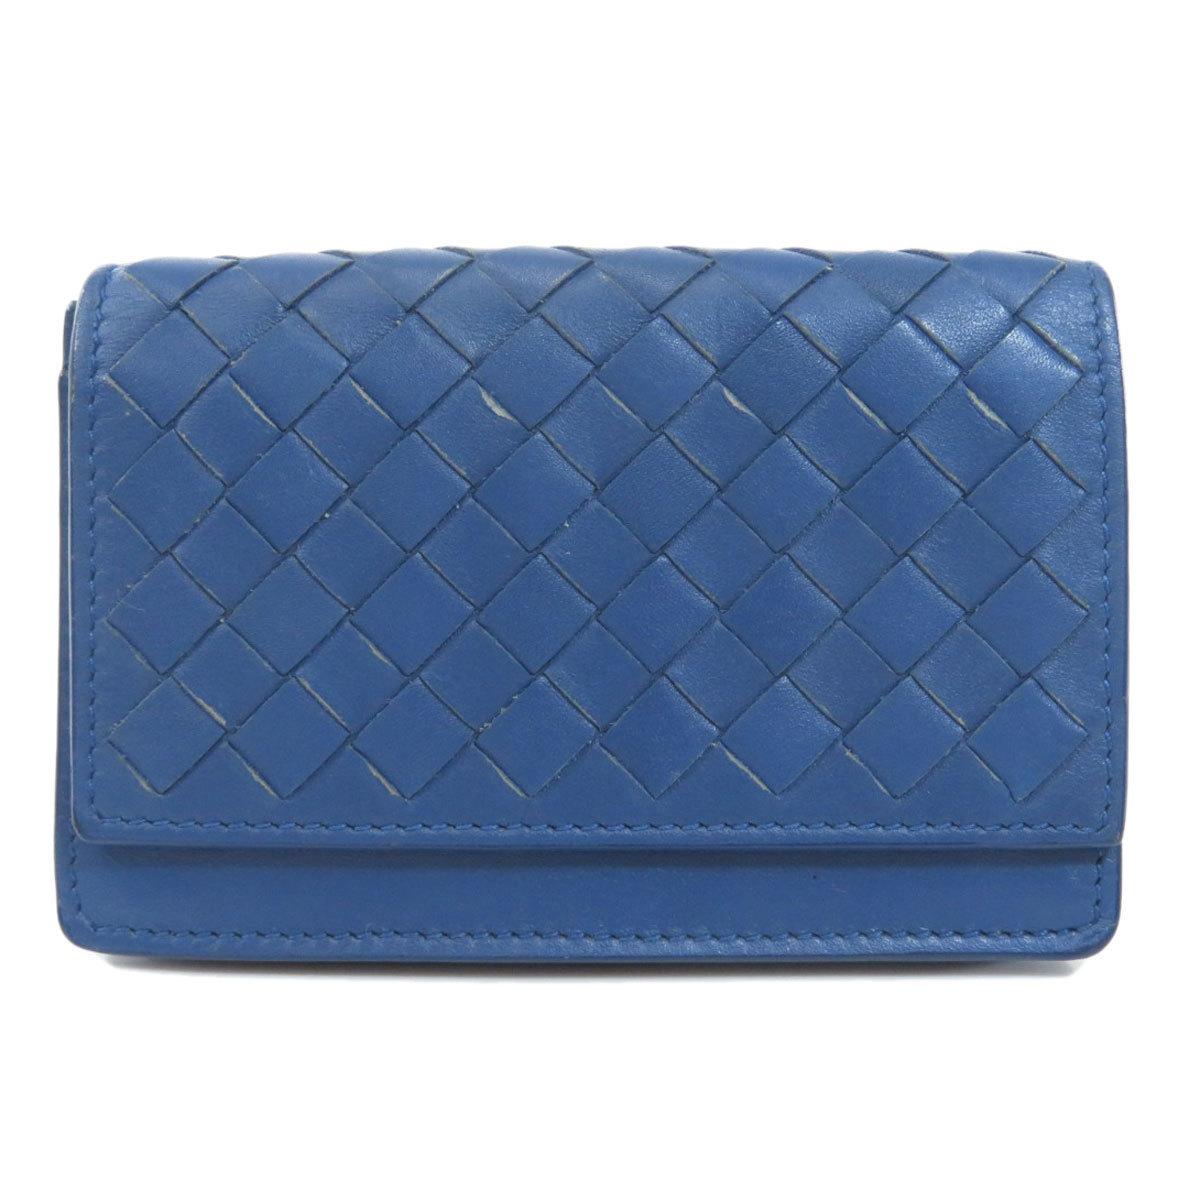 Bottega Veneta Intrecciato Card Case Leather Men's